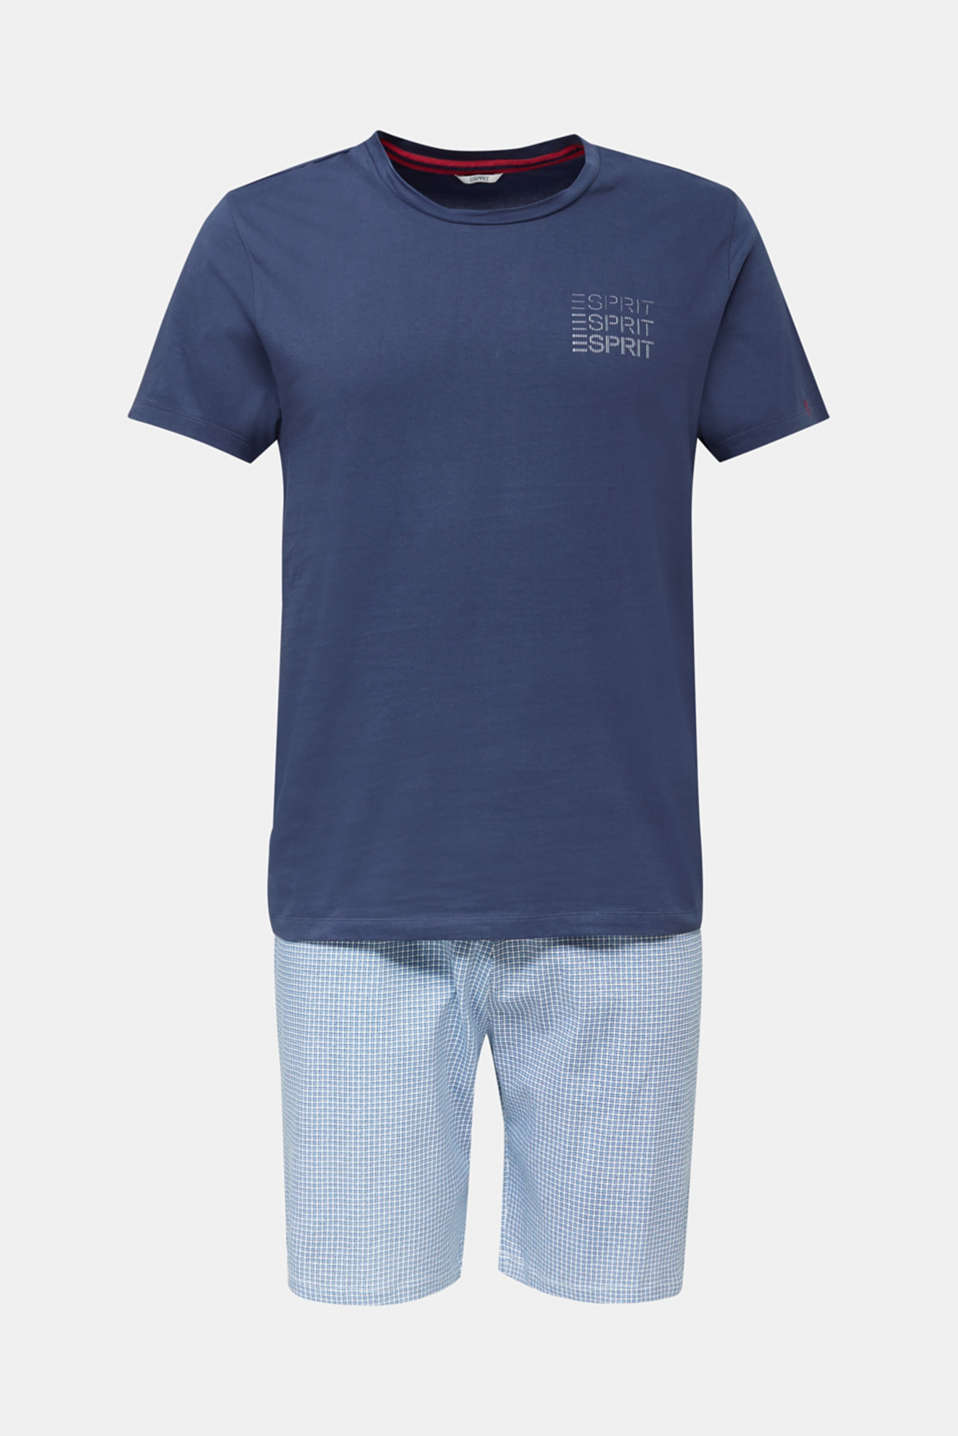 Jersey pyjamas with checks, 100% cotton, NAVY 2, detail image number 3